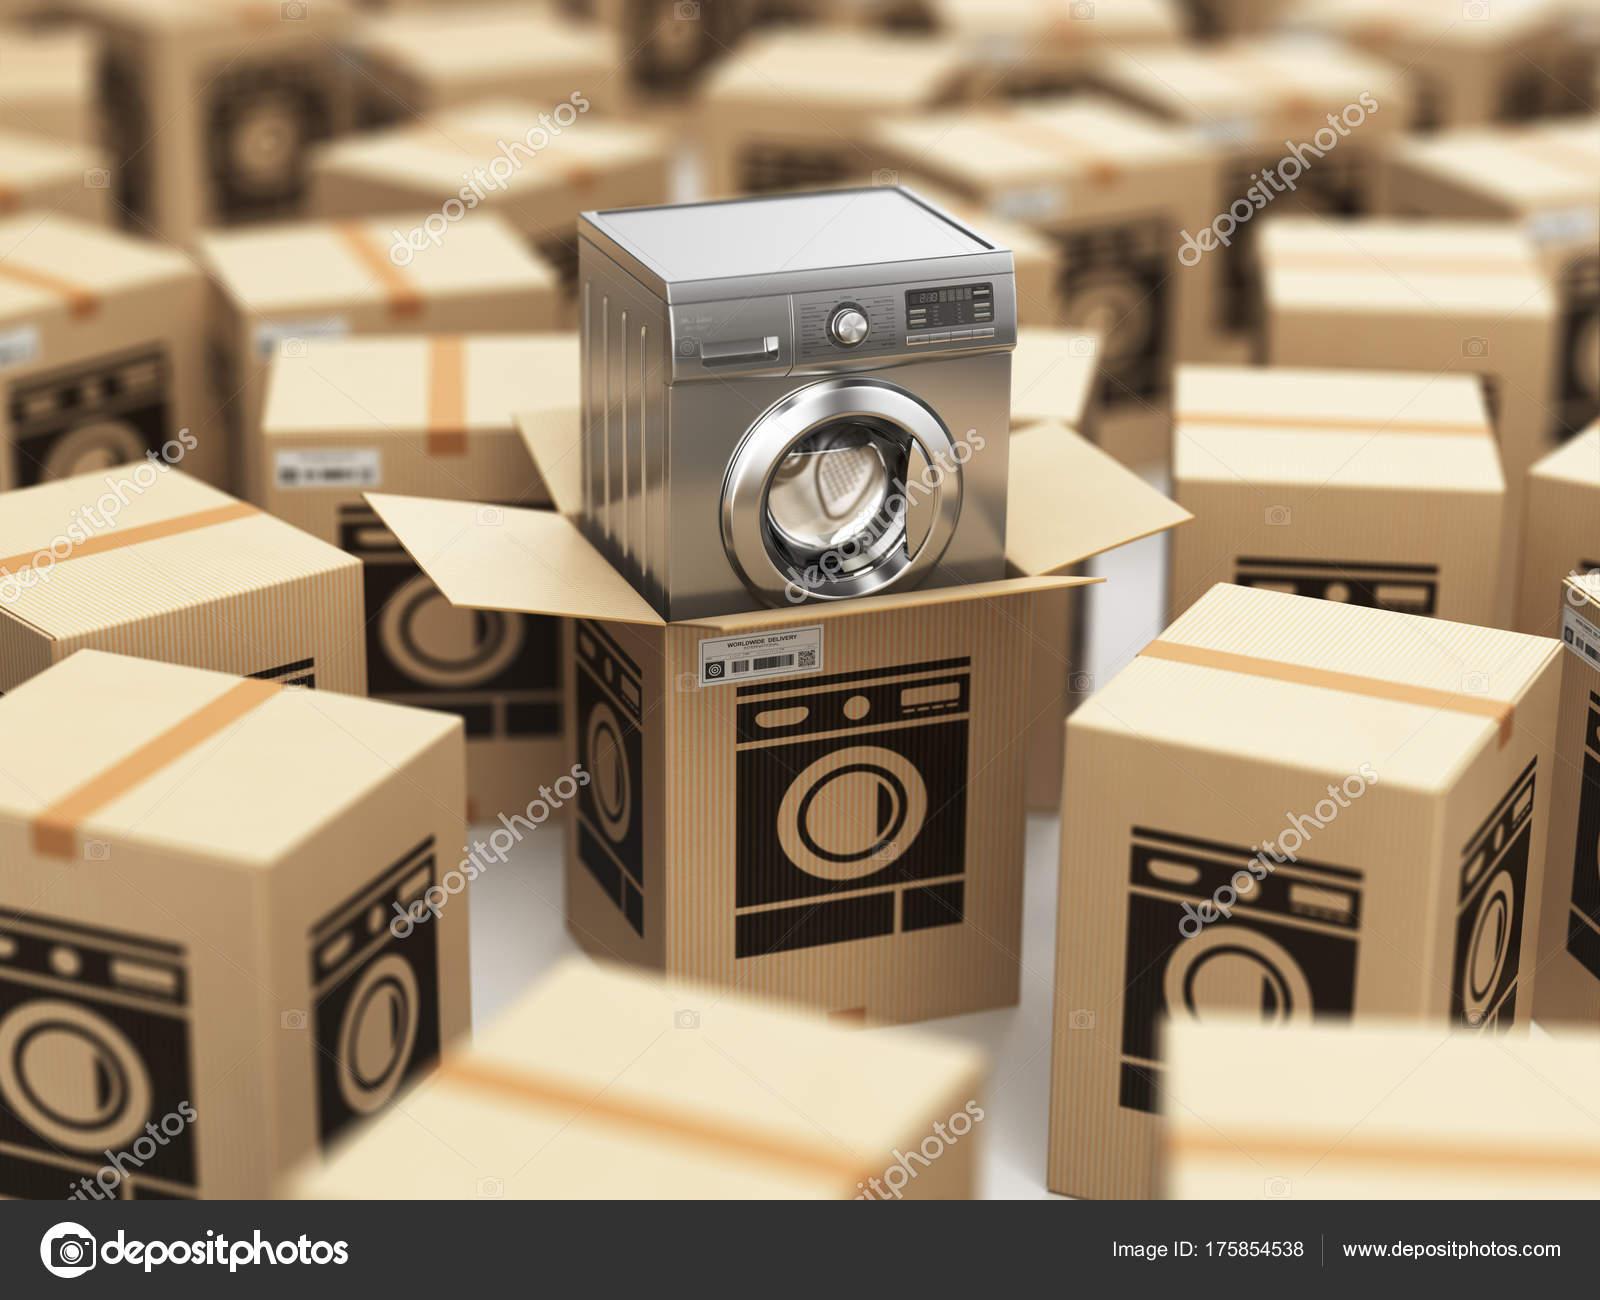 95b0193e605 Πλυντήριο ρούχων σε κουτί από χαρτόνι. Ηλεκτρονικό εμπόριο, internet online  αγορές και η παράδοση έννοια. 3D απεικόνιση — Εικόνα από ...